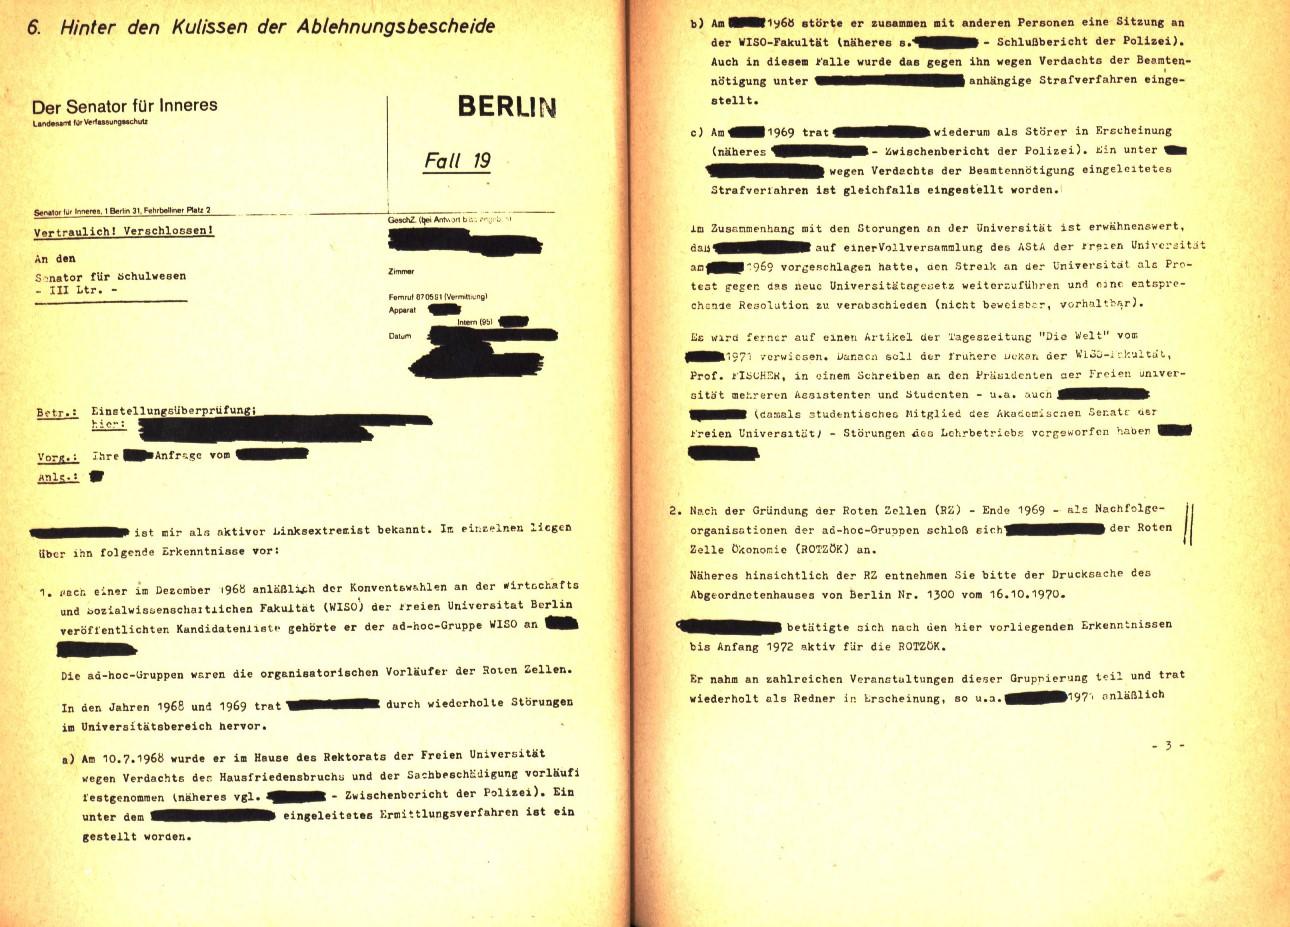 Berlin_VDS_Aktionskomitee_1975_BerufsverboteII_46